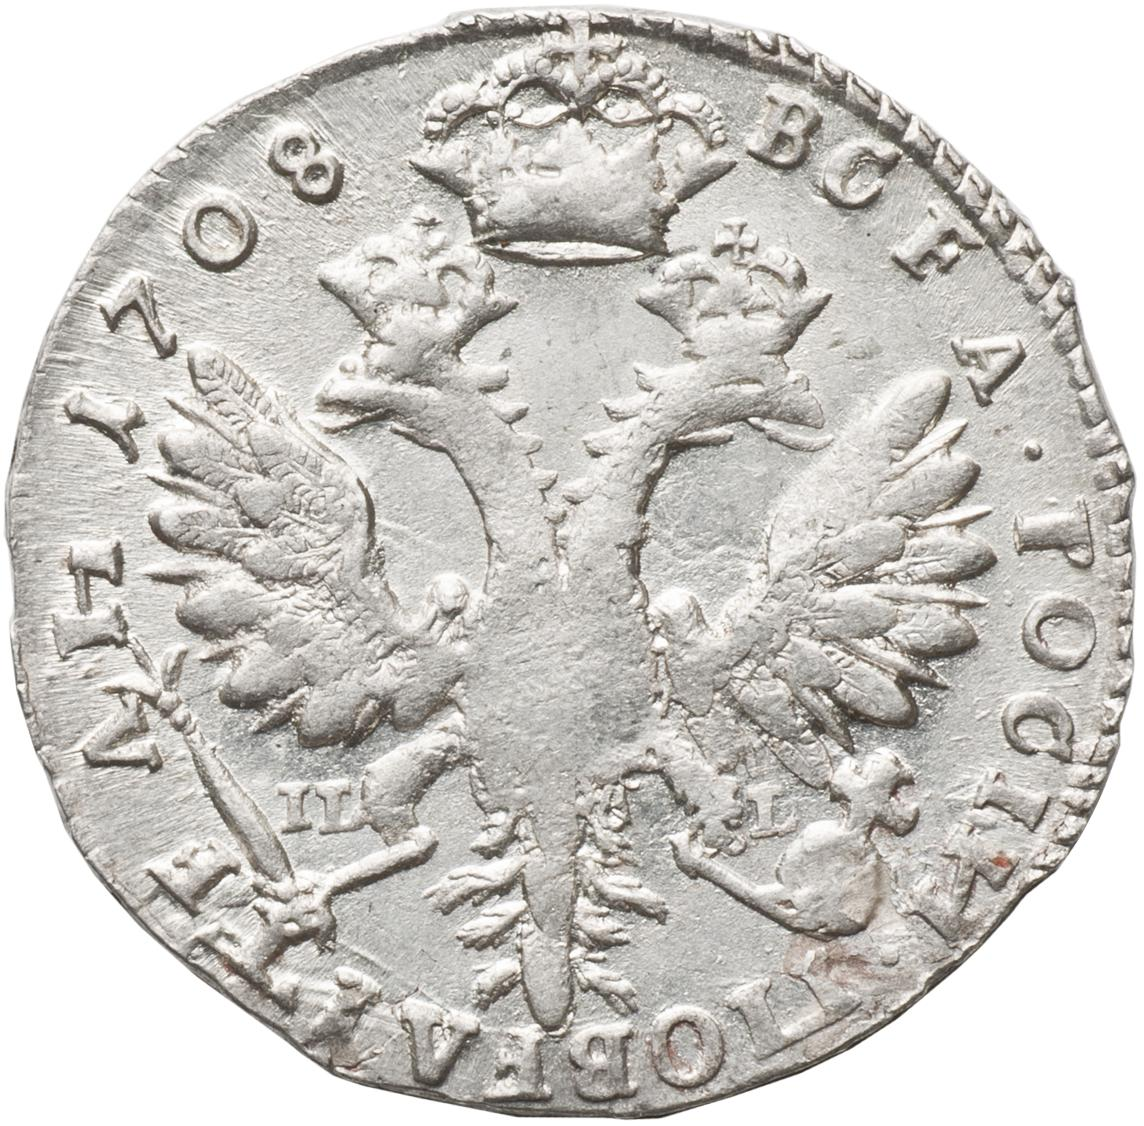 Тинф 1708 г. IL L. Для Речи Посполитой (Петр I). Тиражна монета. Инициалы минцмейстера